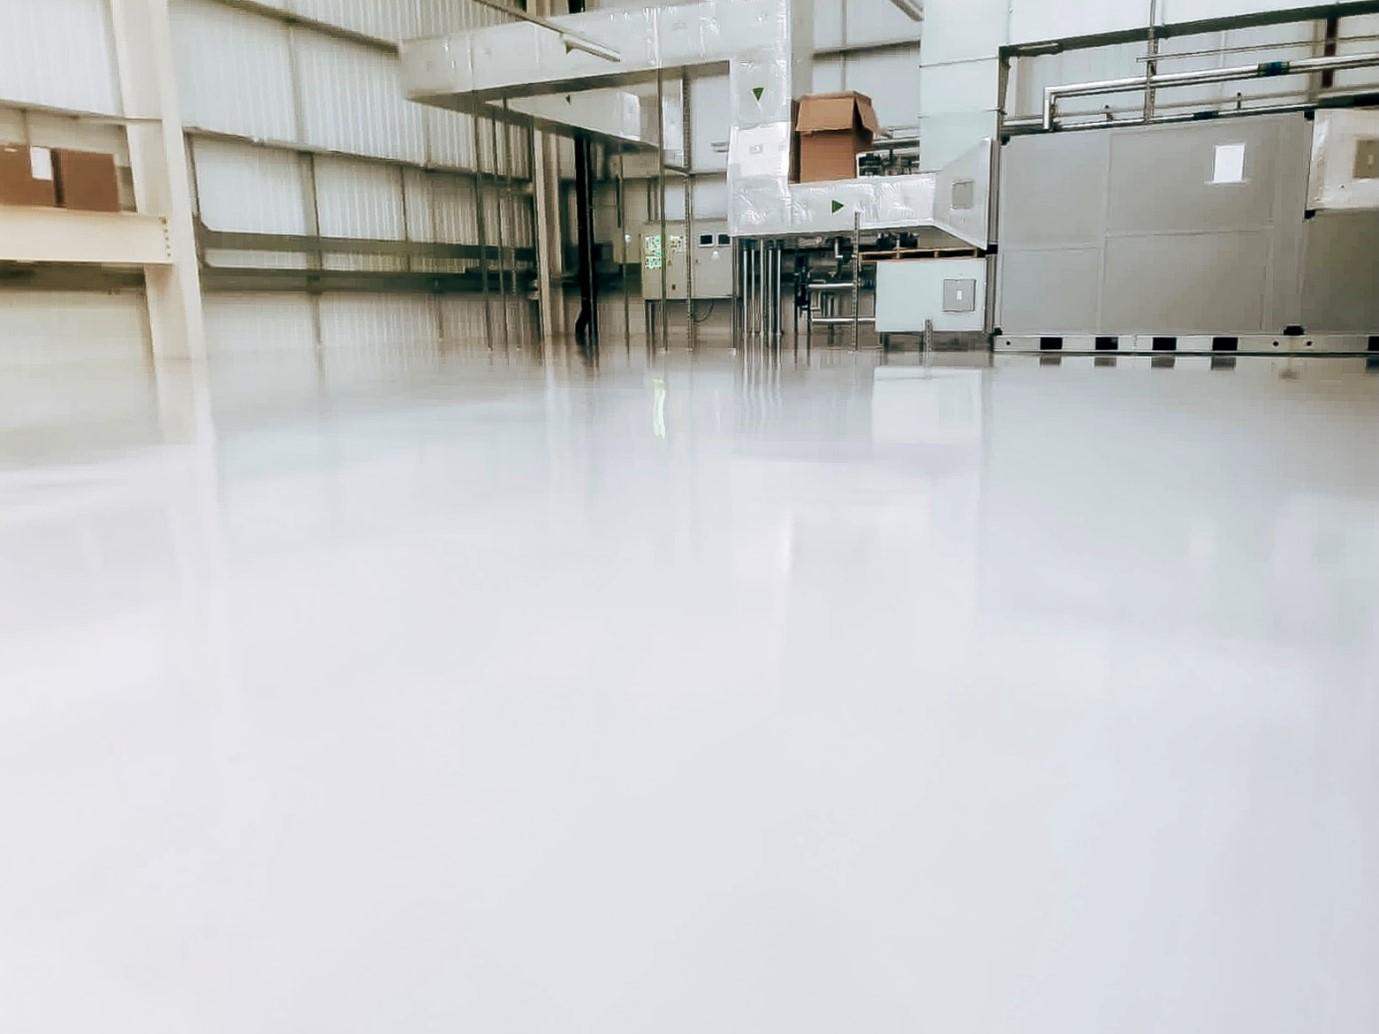 Epoxy resin Floor using Virtus Strongcoat at Jaguar Land Rover Manufacturing Plant